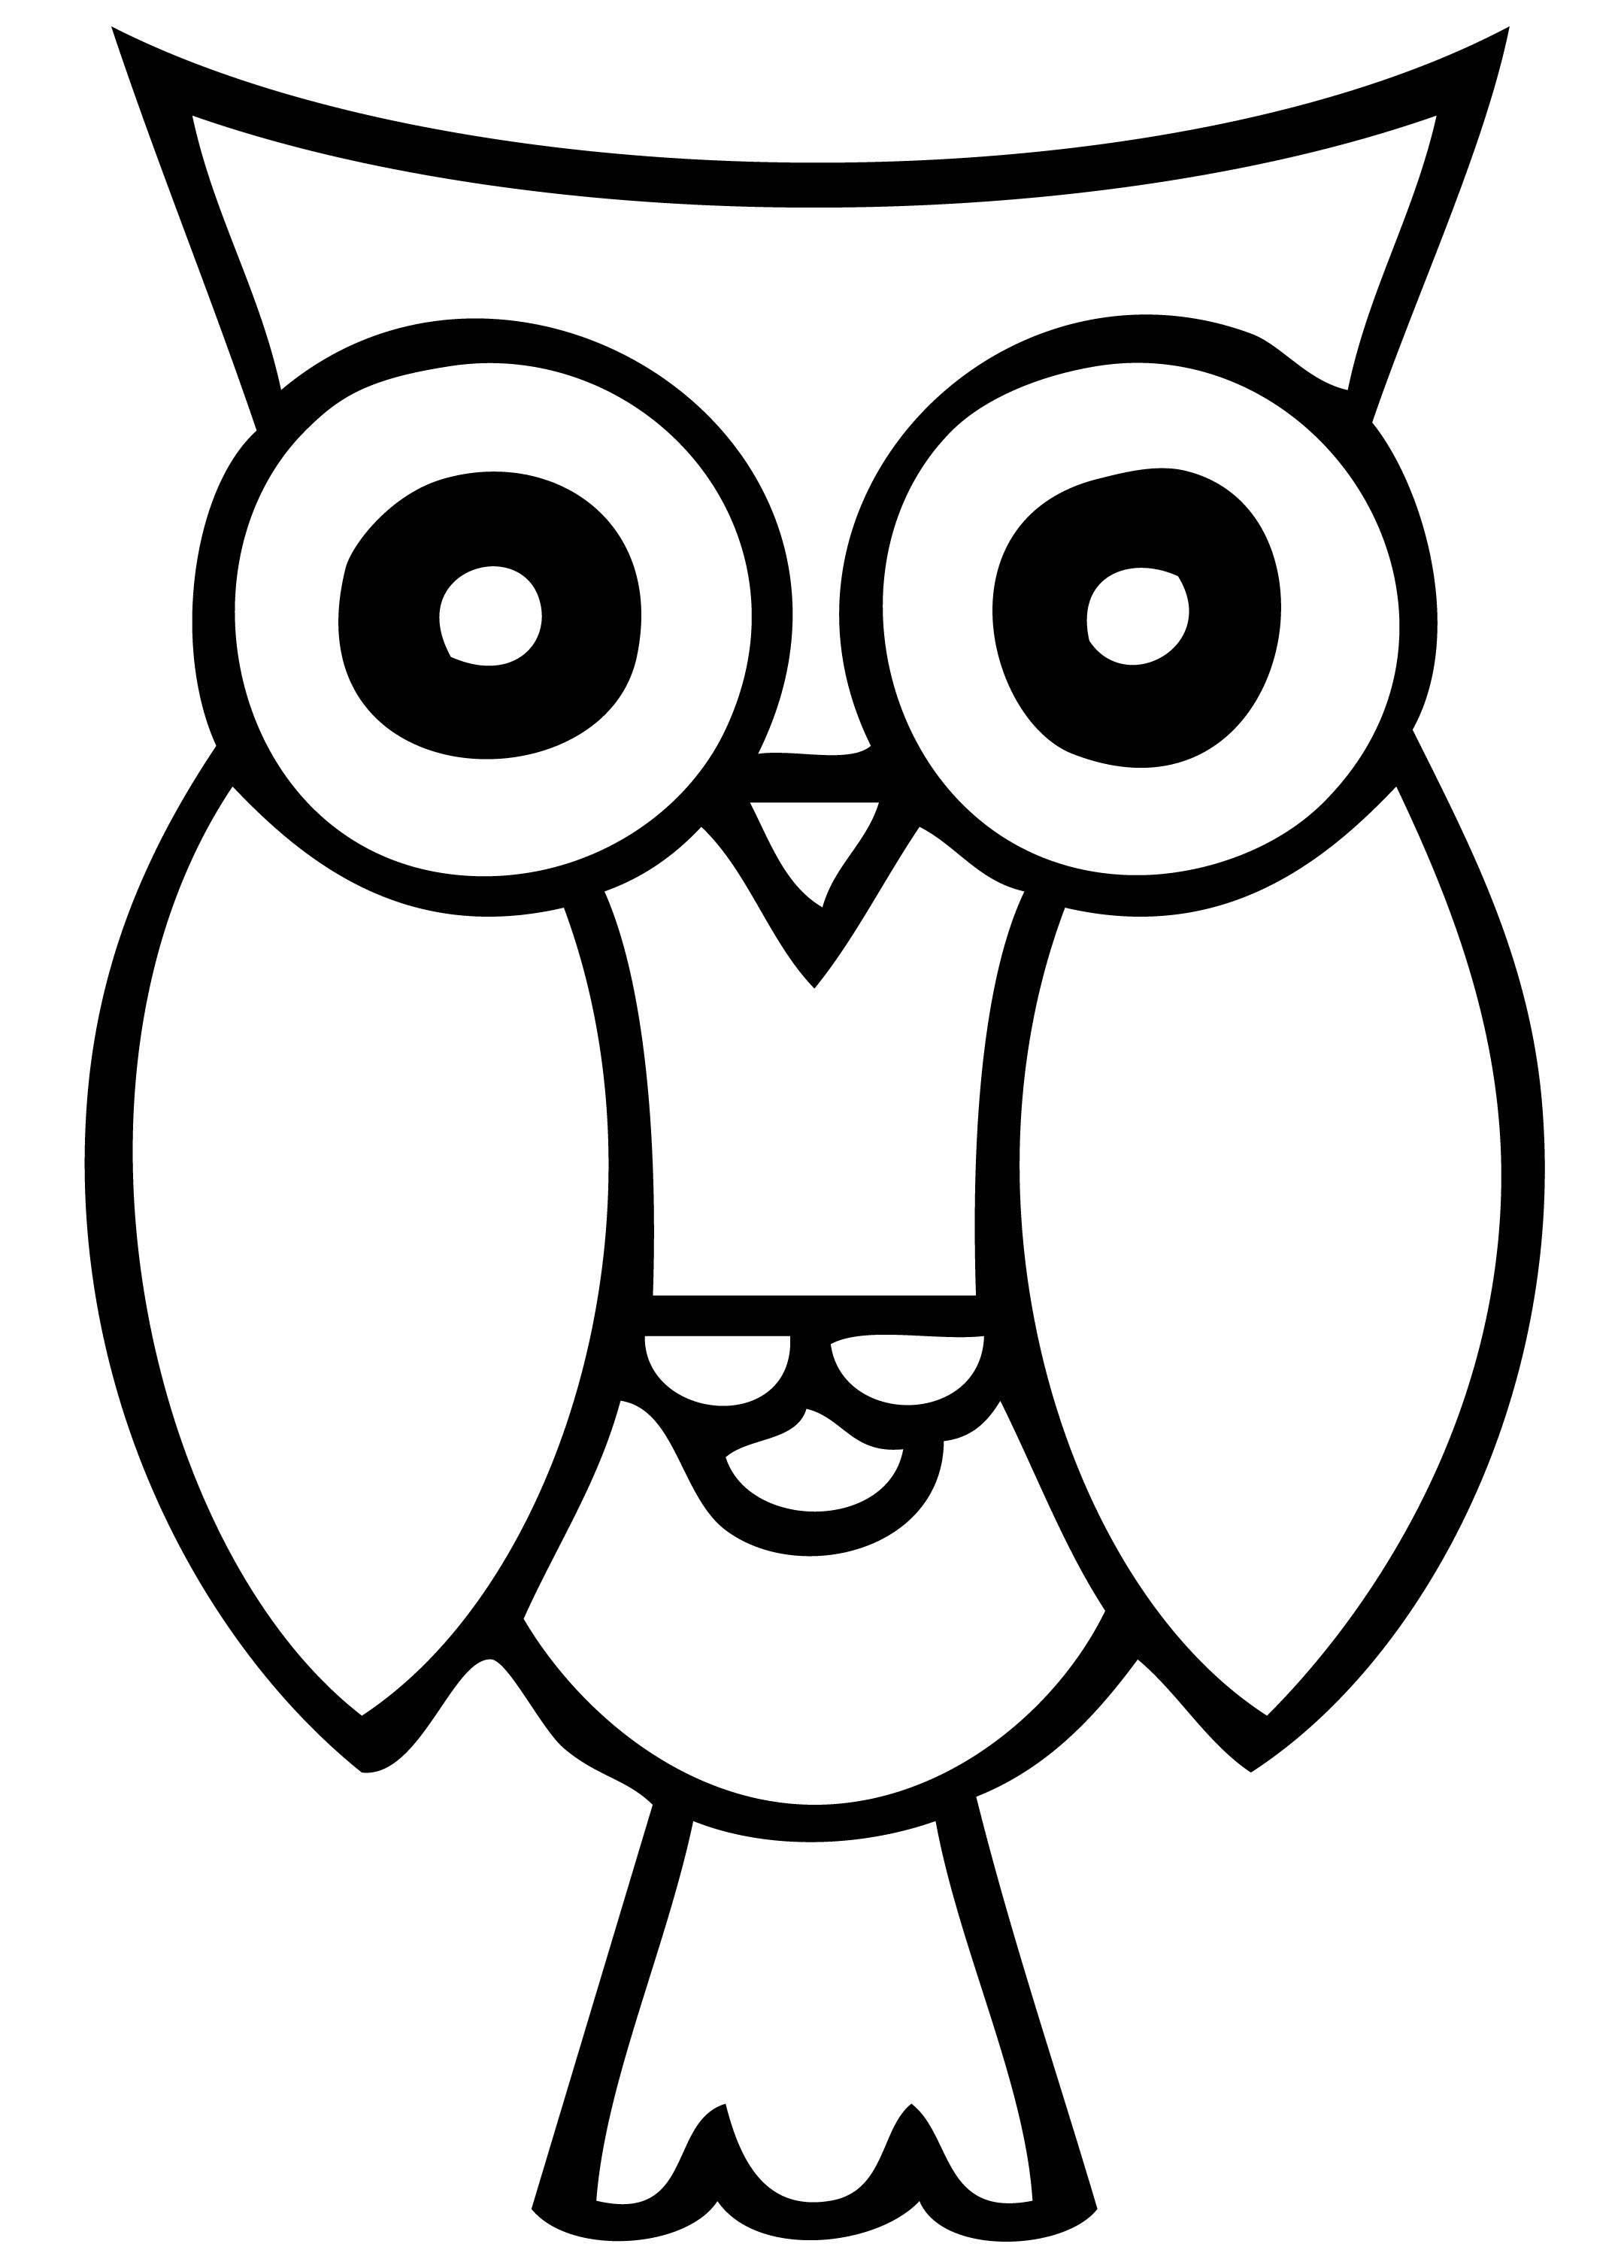 Owl Clip Art Black And White